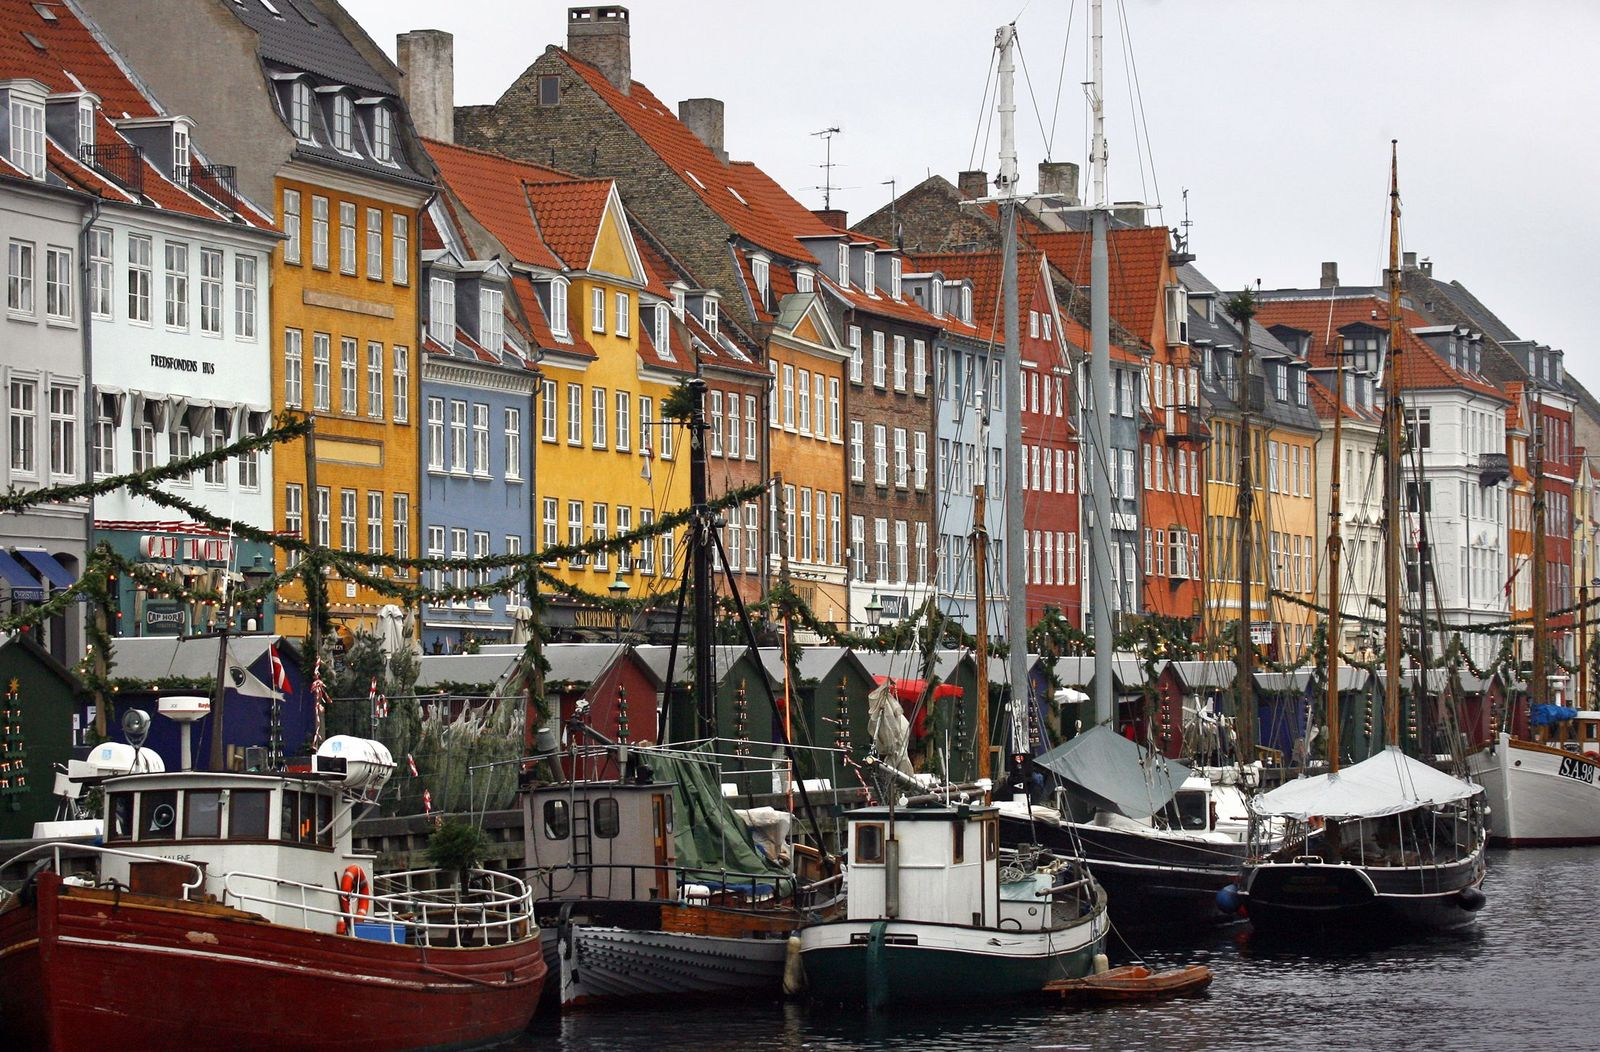 Kopenhagen / Dänemark / Länder / Reiseland / Urlaub